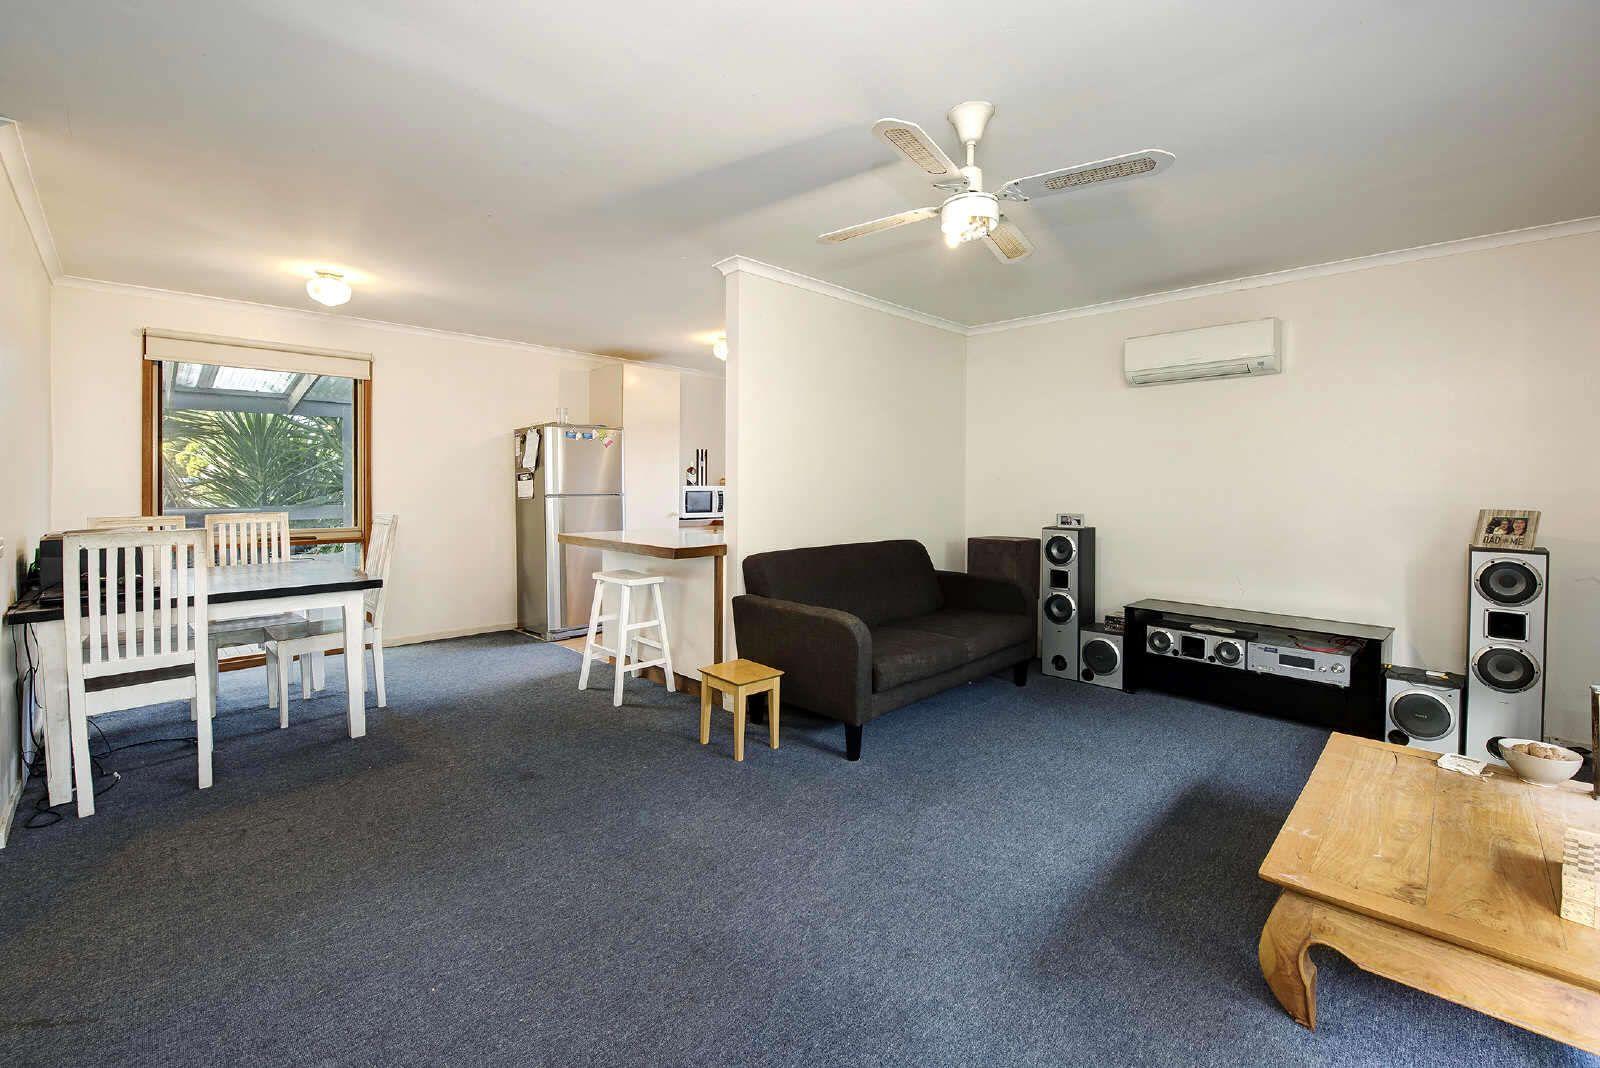 18 Villawood Drive, Hastings VIC 3915, Image 0